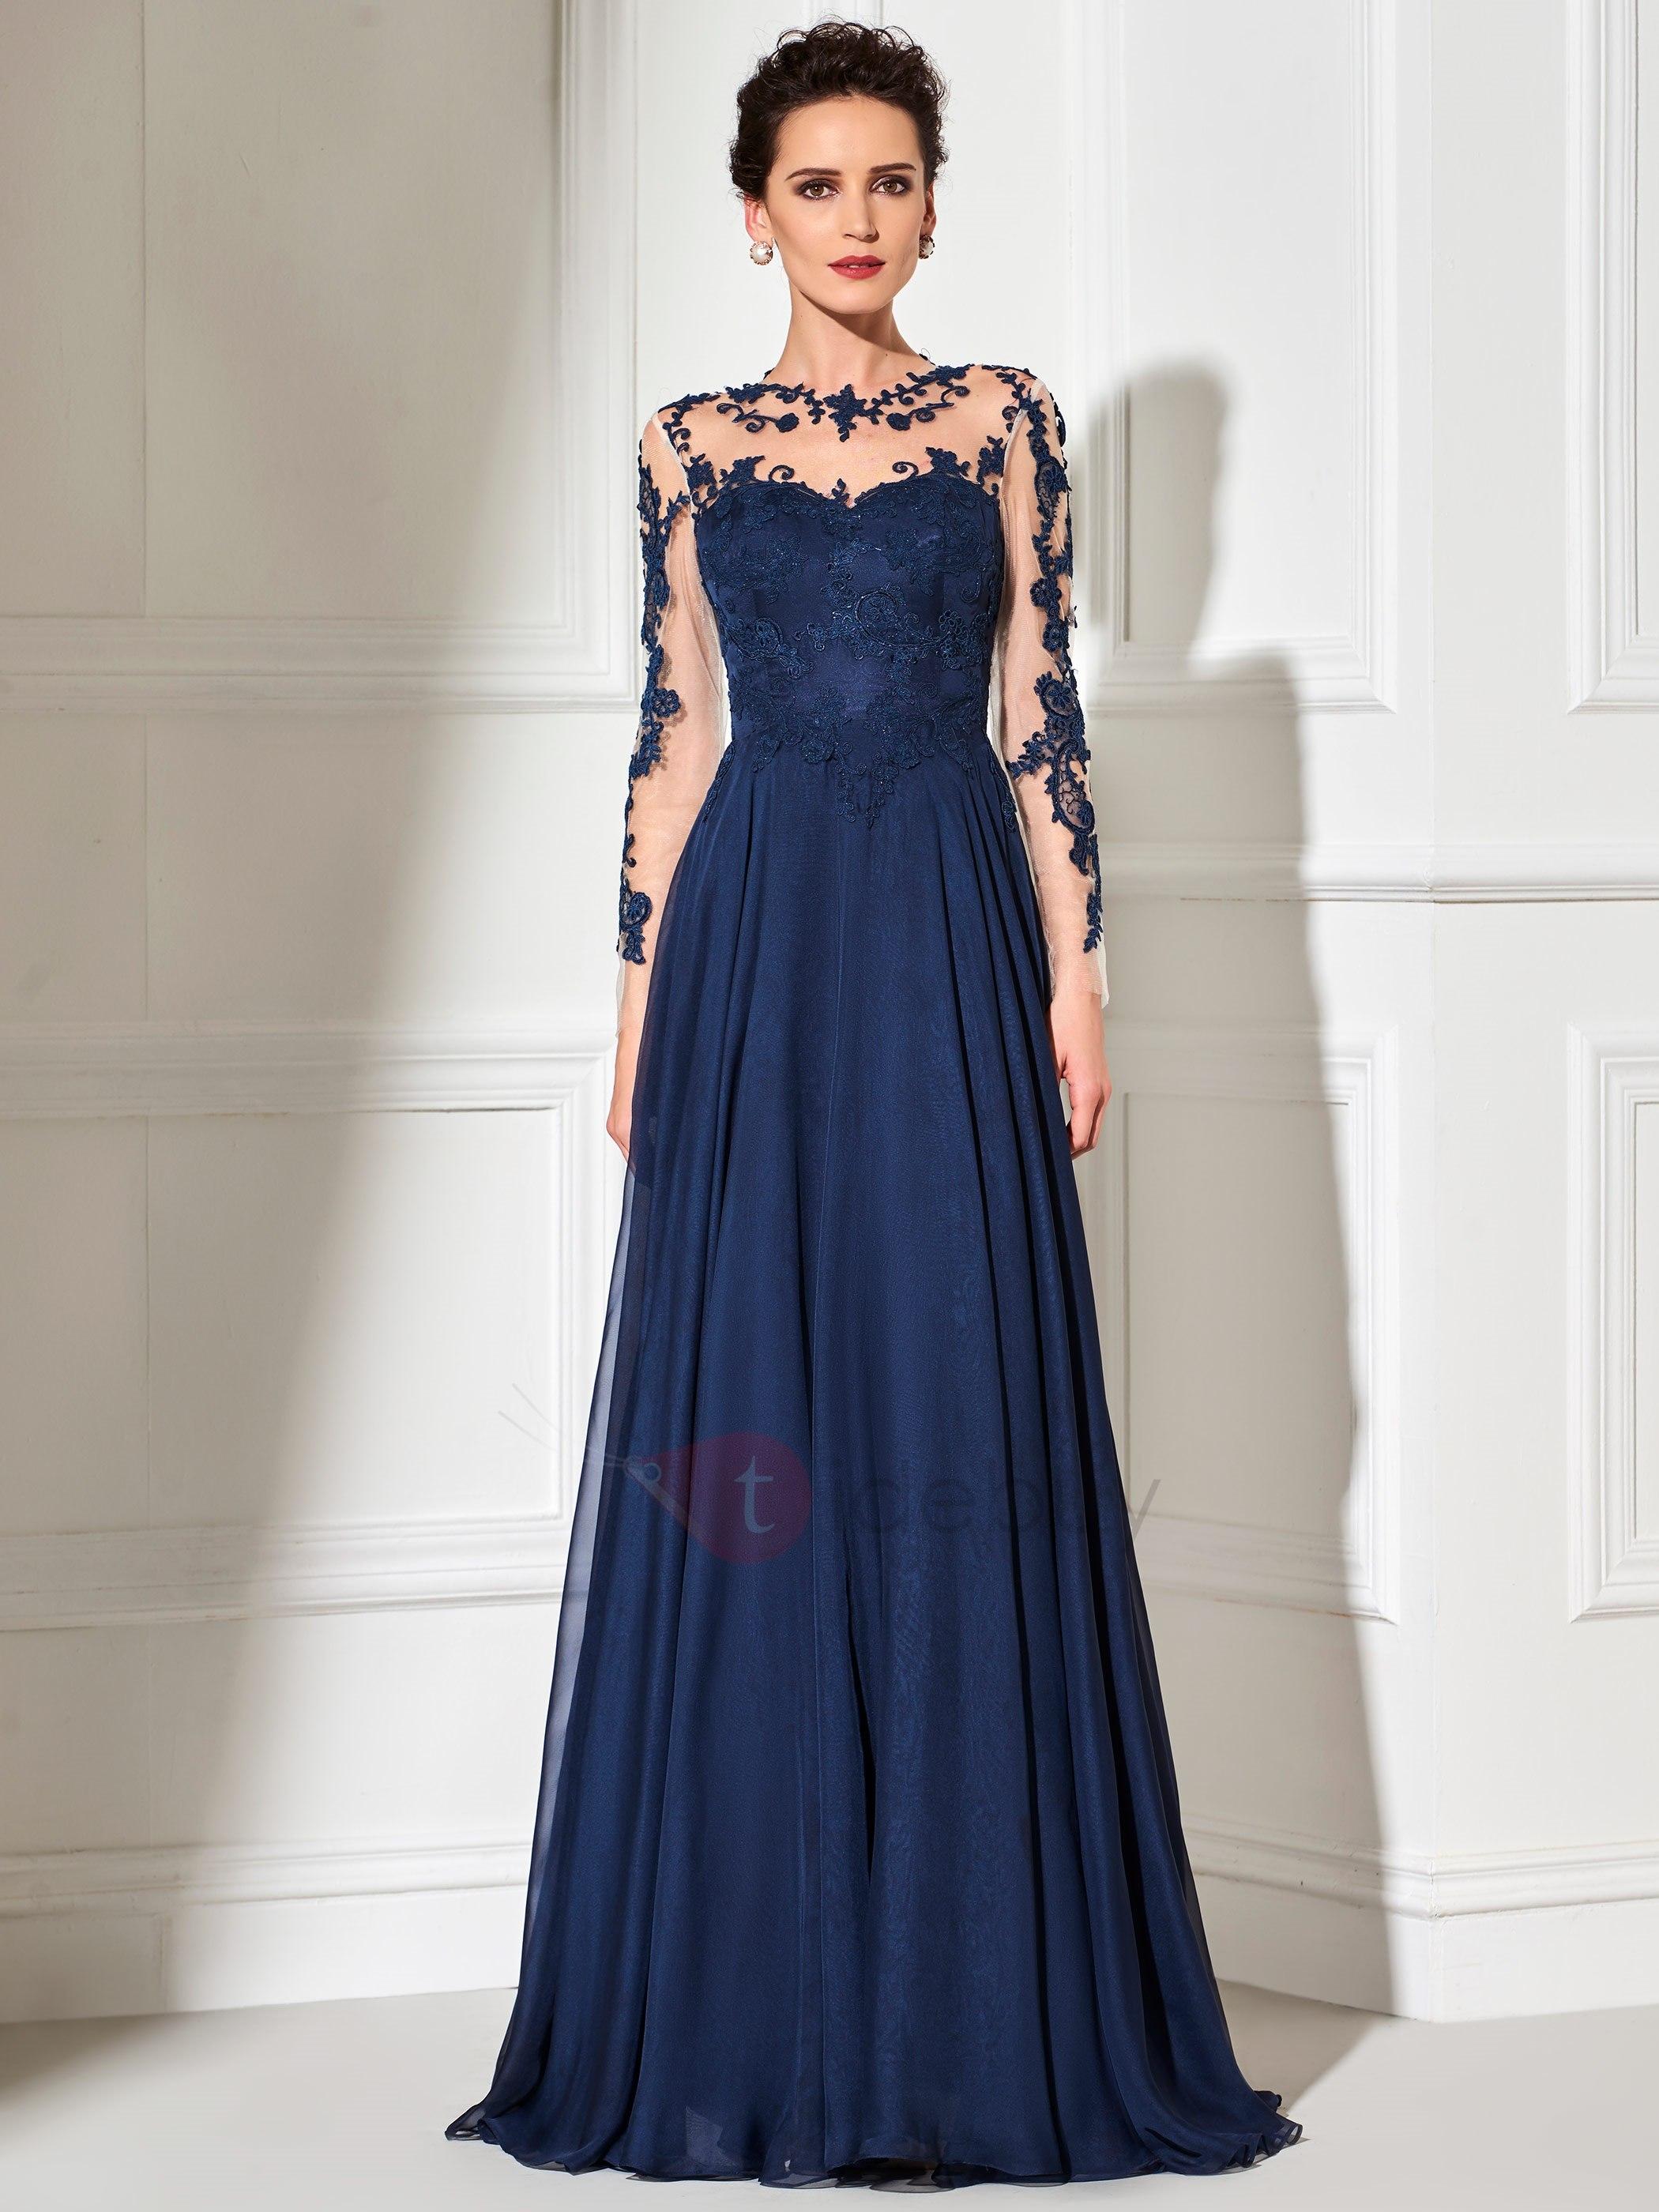 بالصور فستان سهرة , فساتين سواريهات للافراح 3500 3